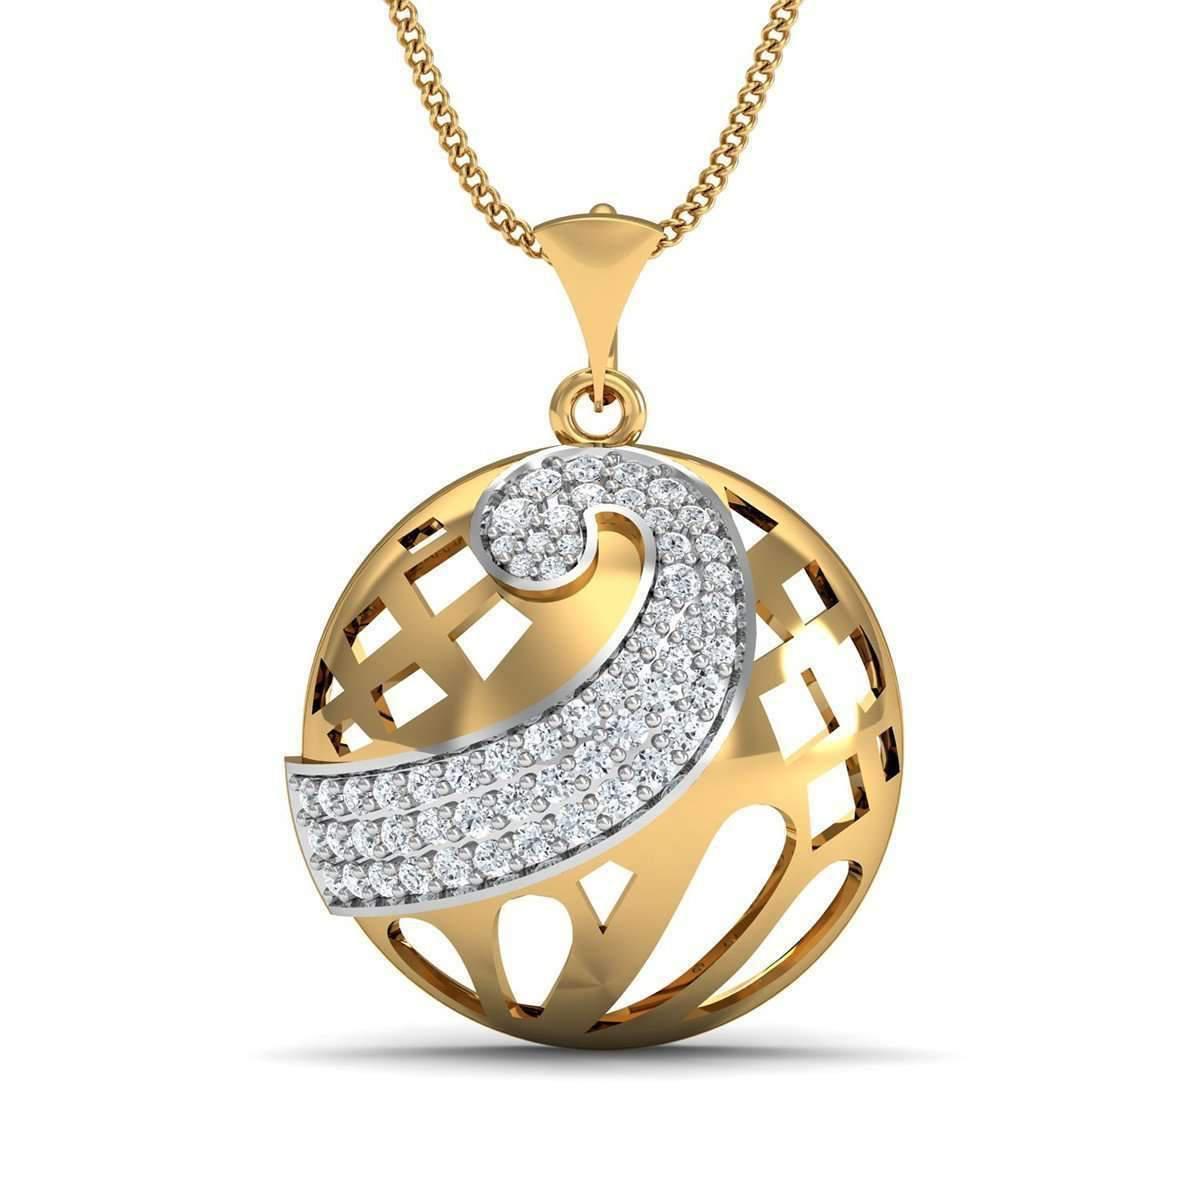 Diamoire Jewels 18kt Yellow Gold and Diamond Pave Pendant H6wXYwjKa